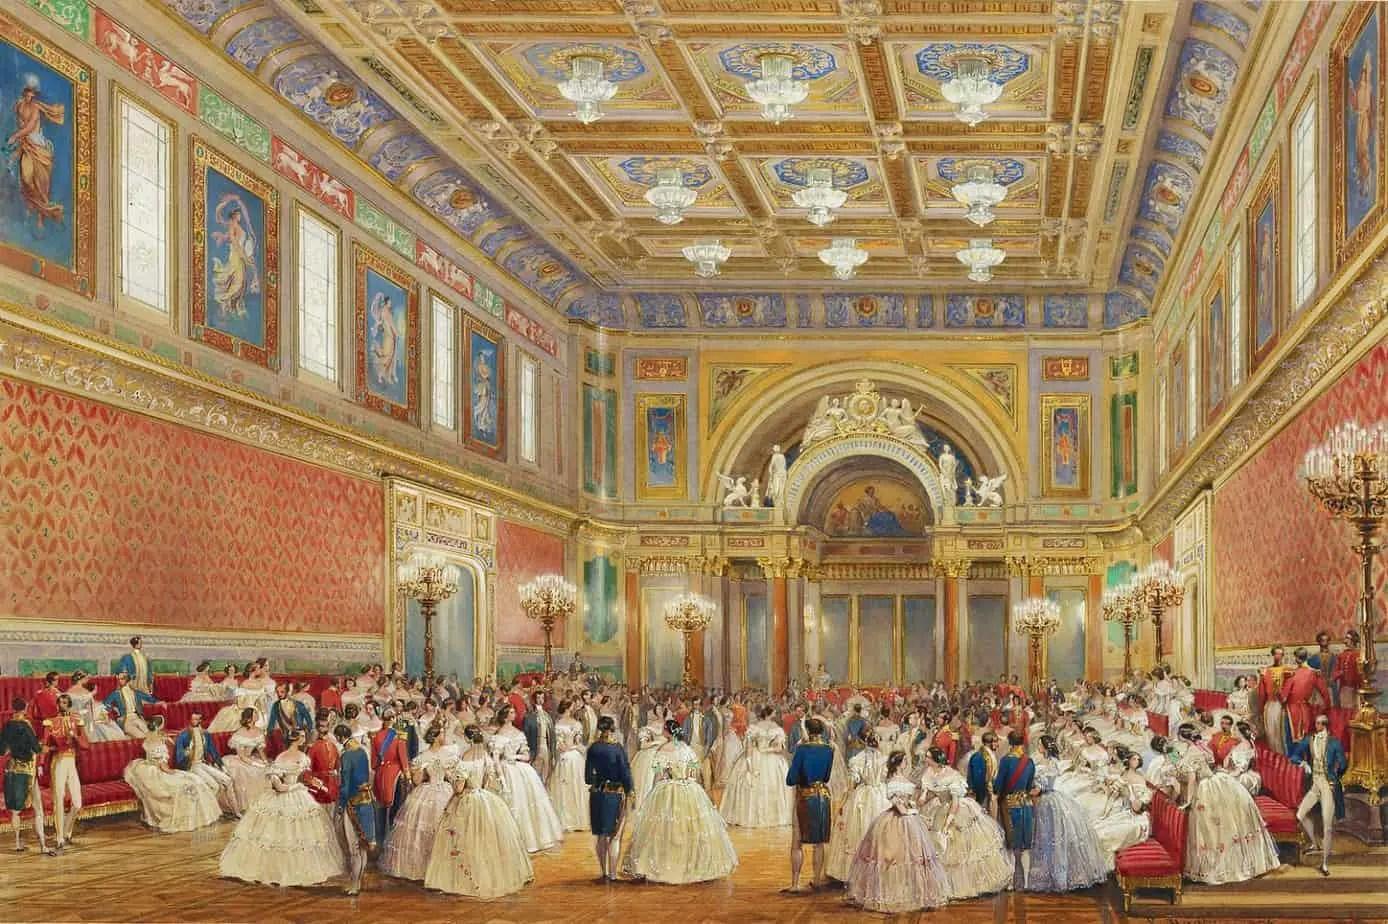 Louis Haghe - The Ballroom, Buckingham Palace, 17 June 1856